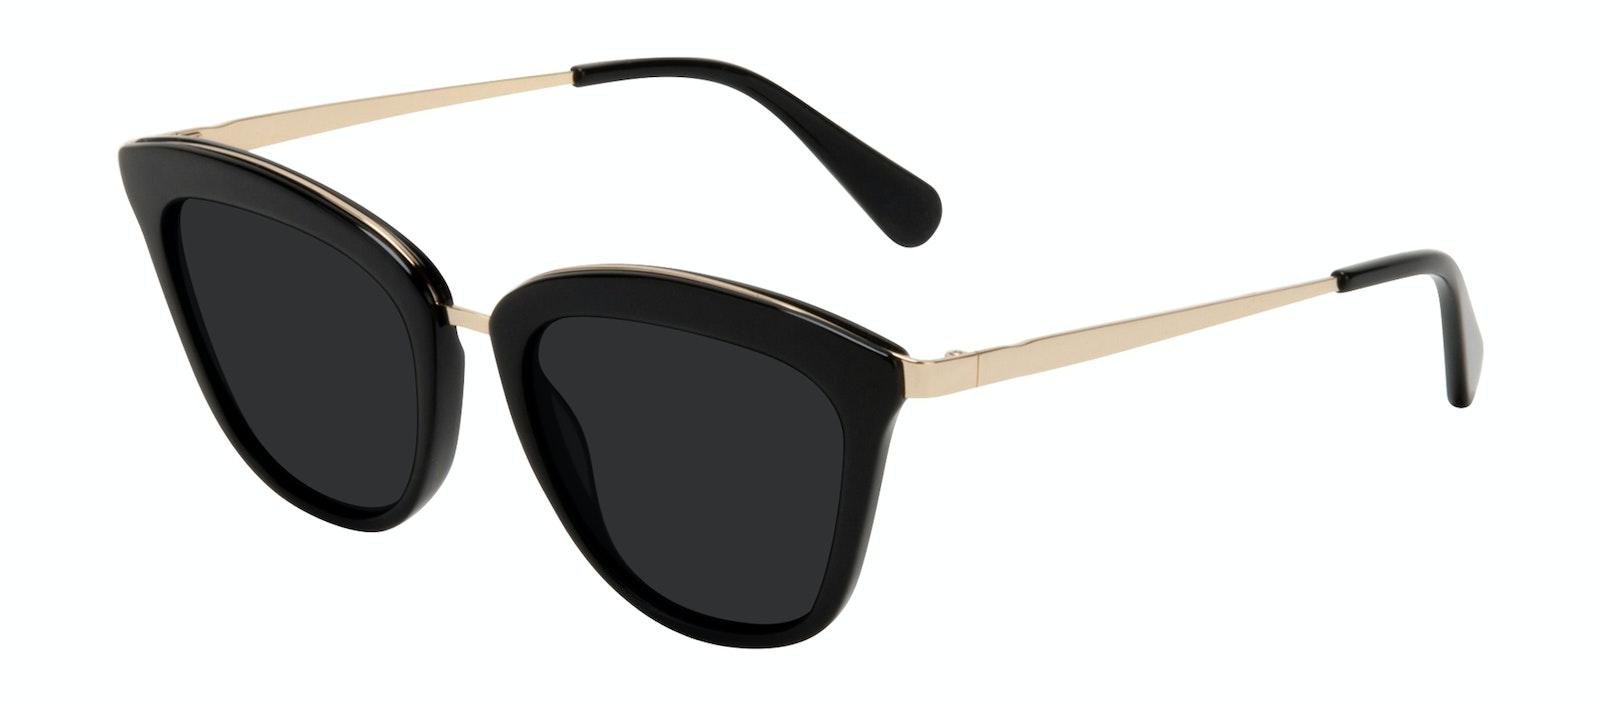 Affordable Fashion Glasses Cat Eye Sunglasses Women More S Onyx Tilt